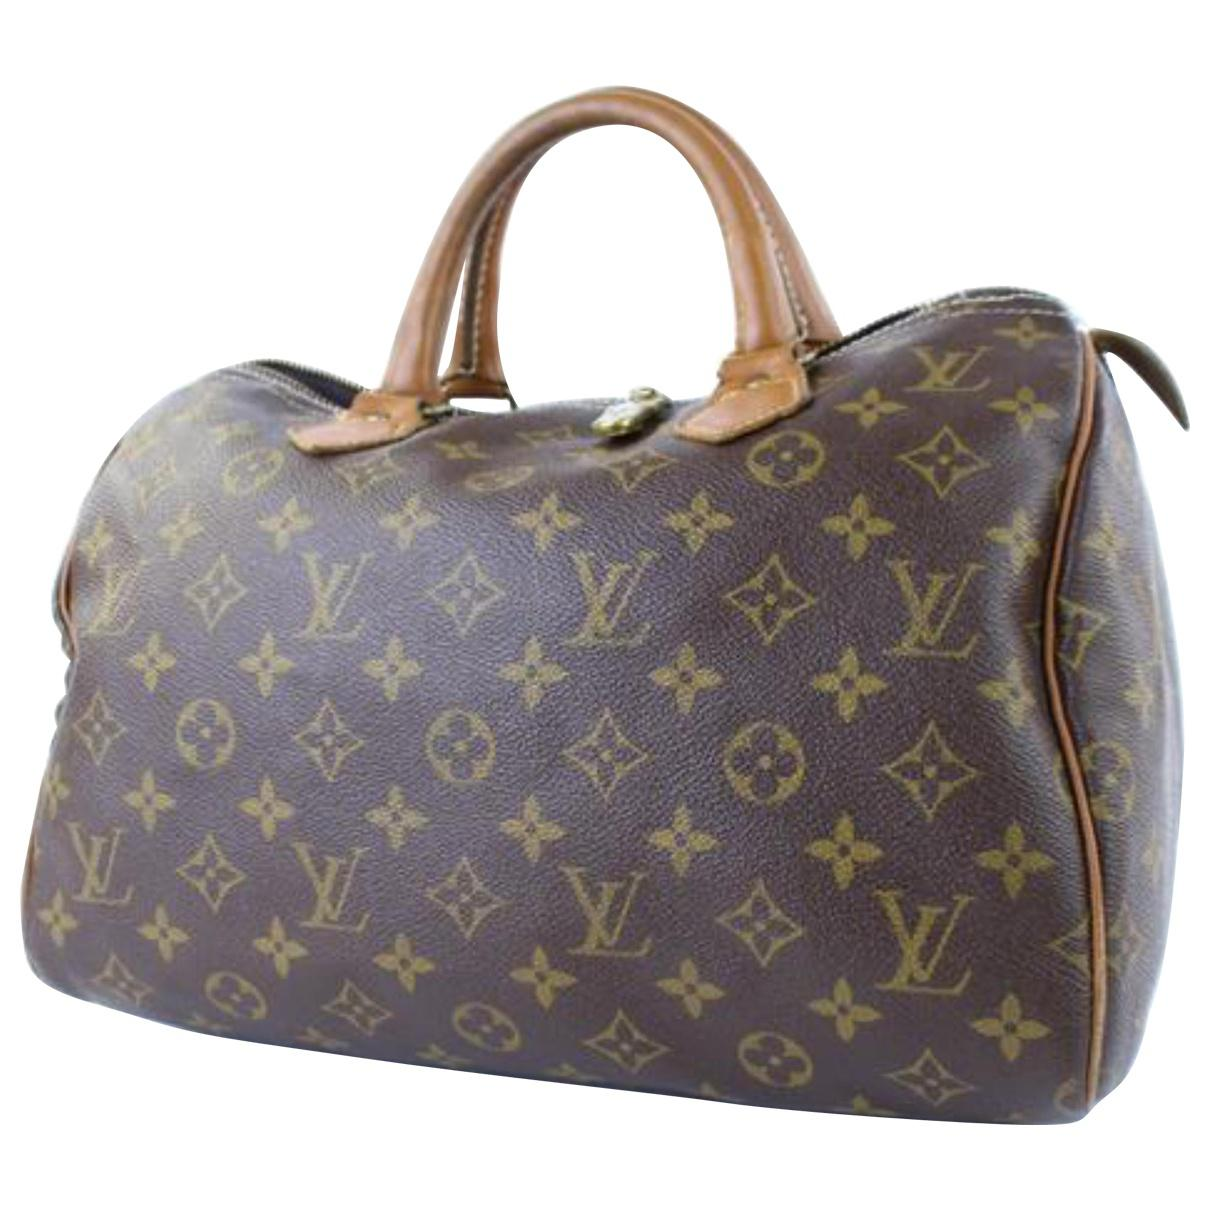 Pre-owned - Speedy cloth handbag Louis Vuitton KlOmU